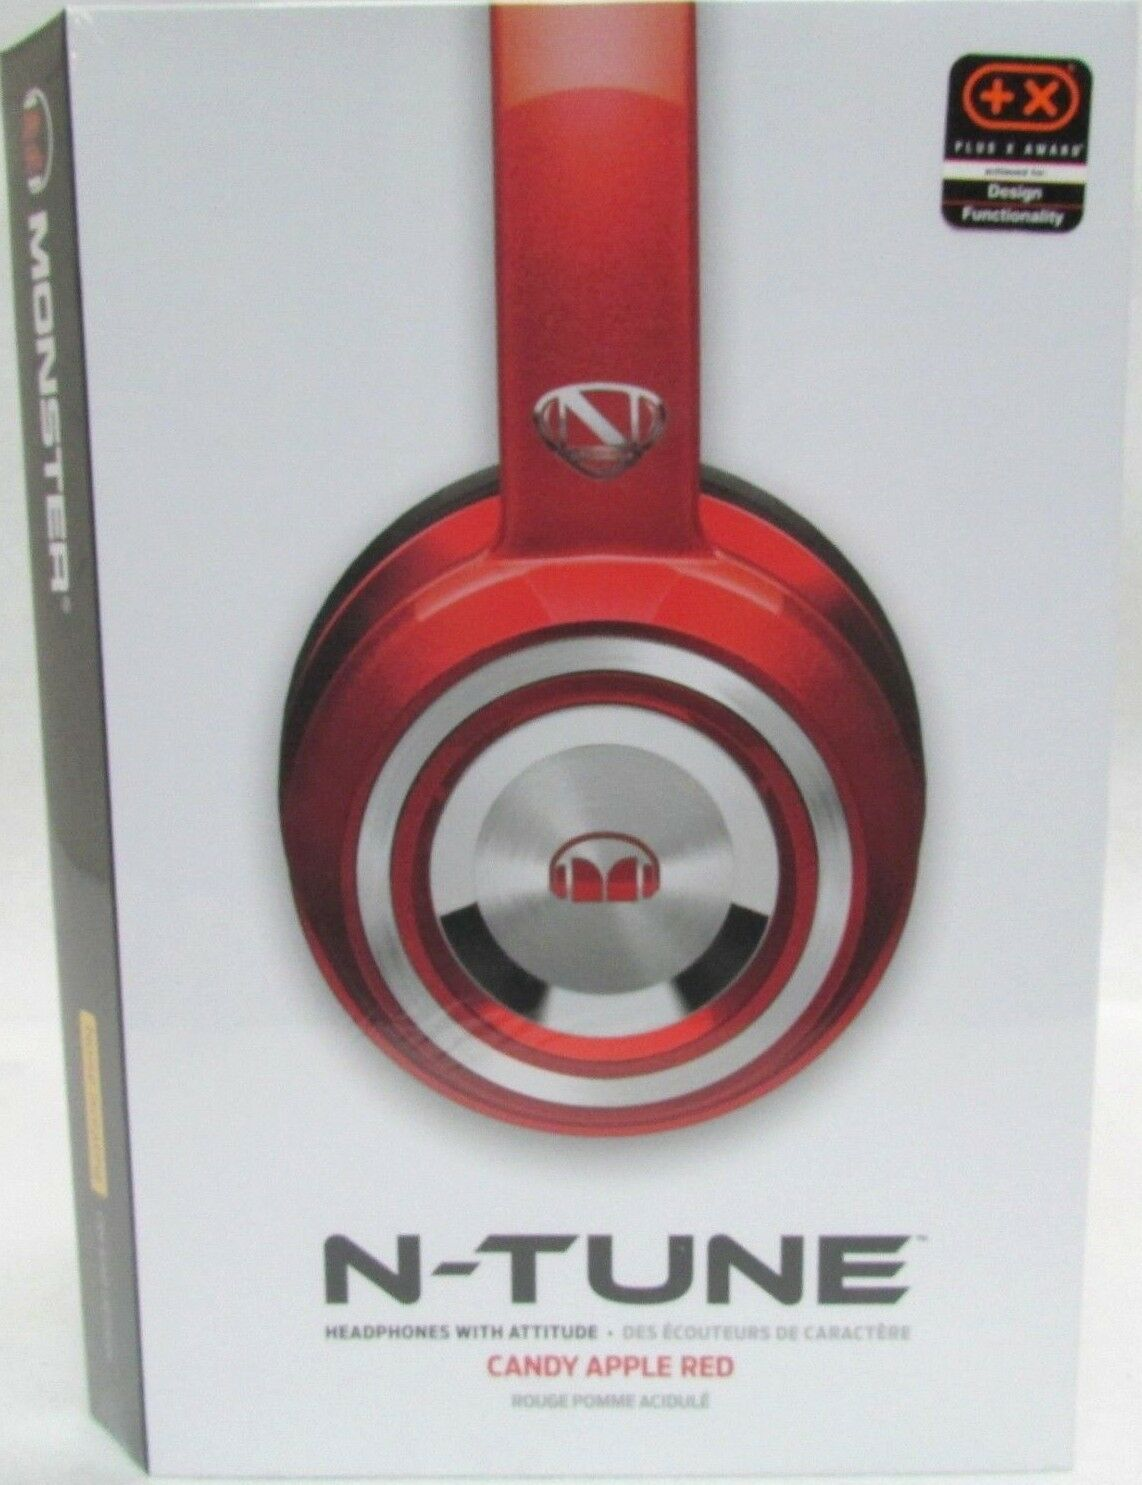 Monster NCredible NTune On-Ear Headphones Candy Red